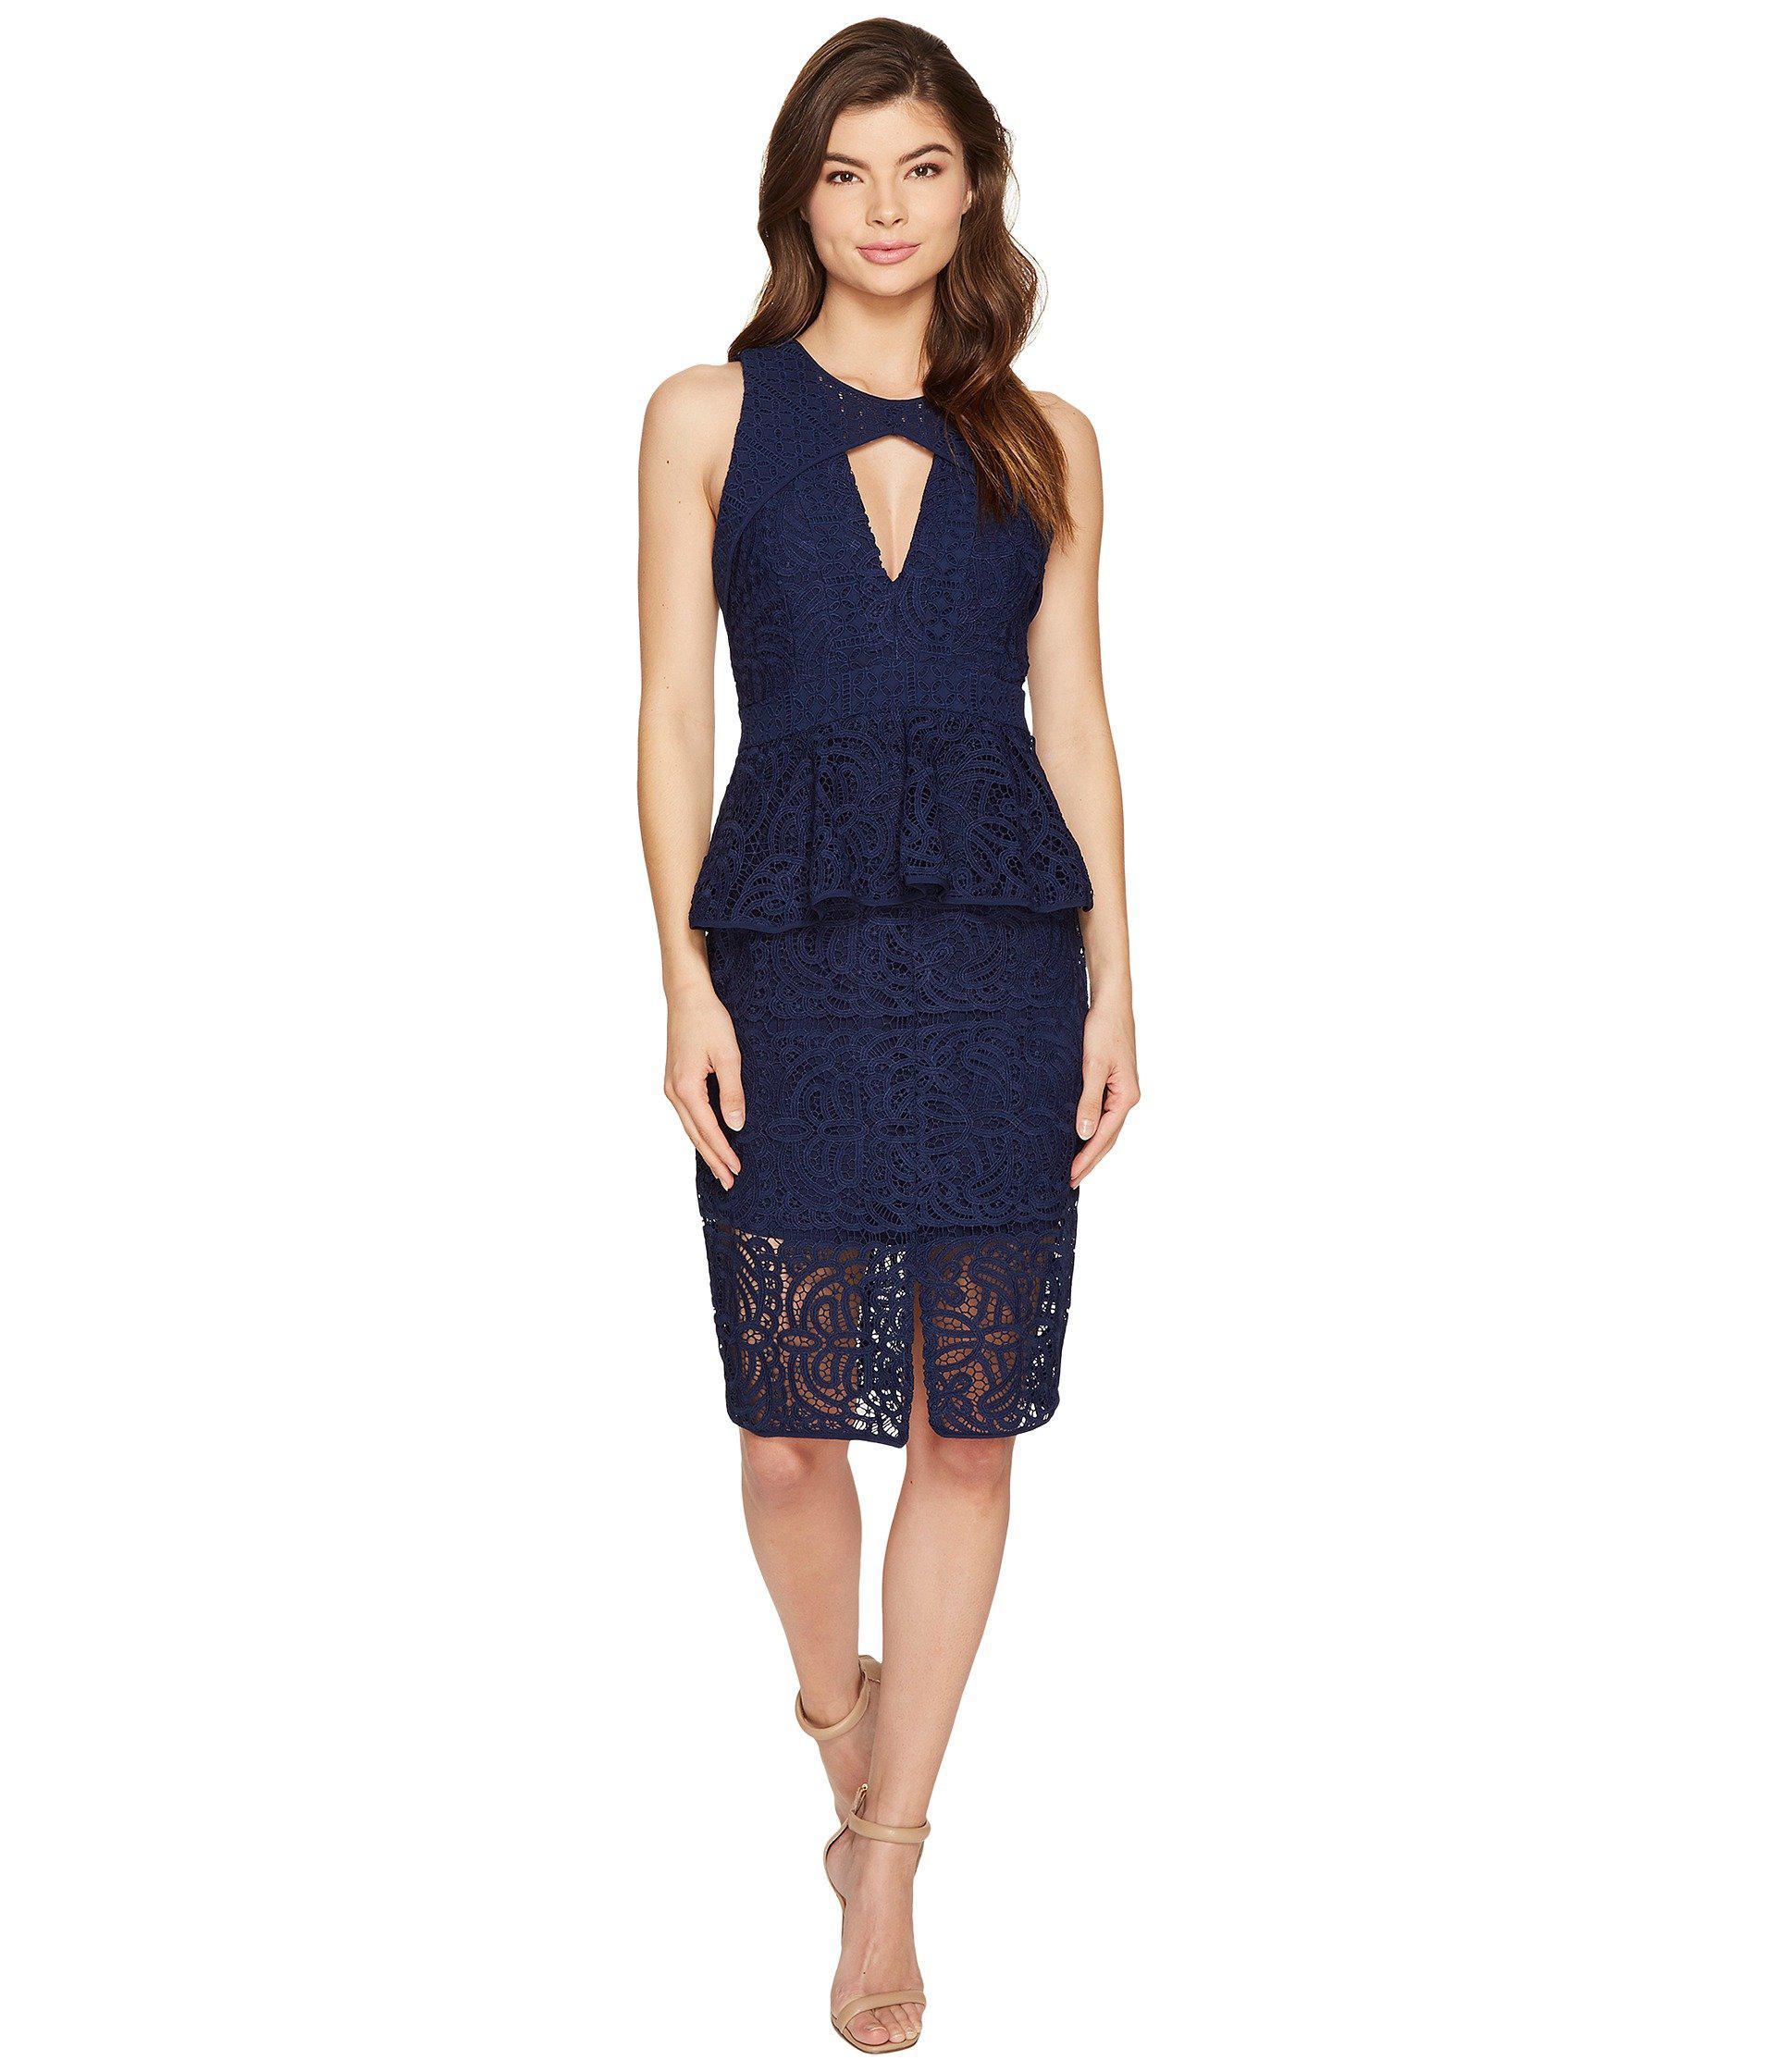 Lyst - Adelyn Rae Laureen Woven Lace Sheath Dress in Blue bfc0cbcc0d